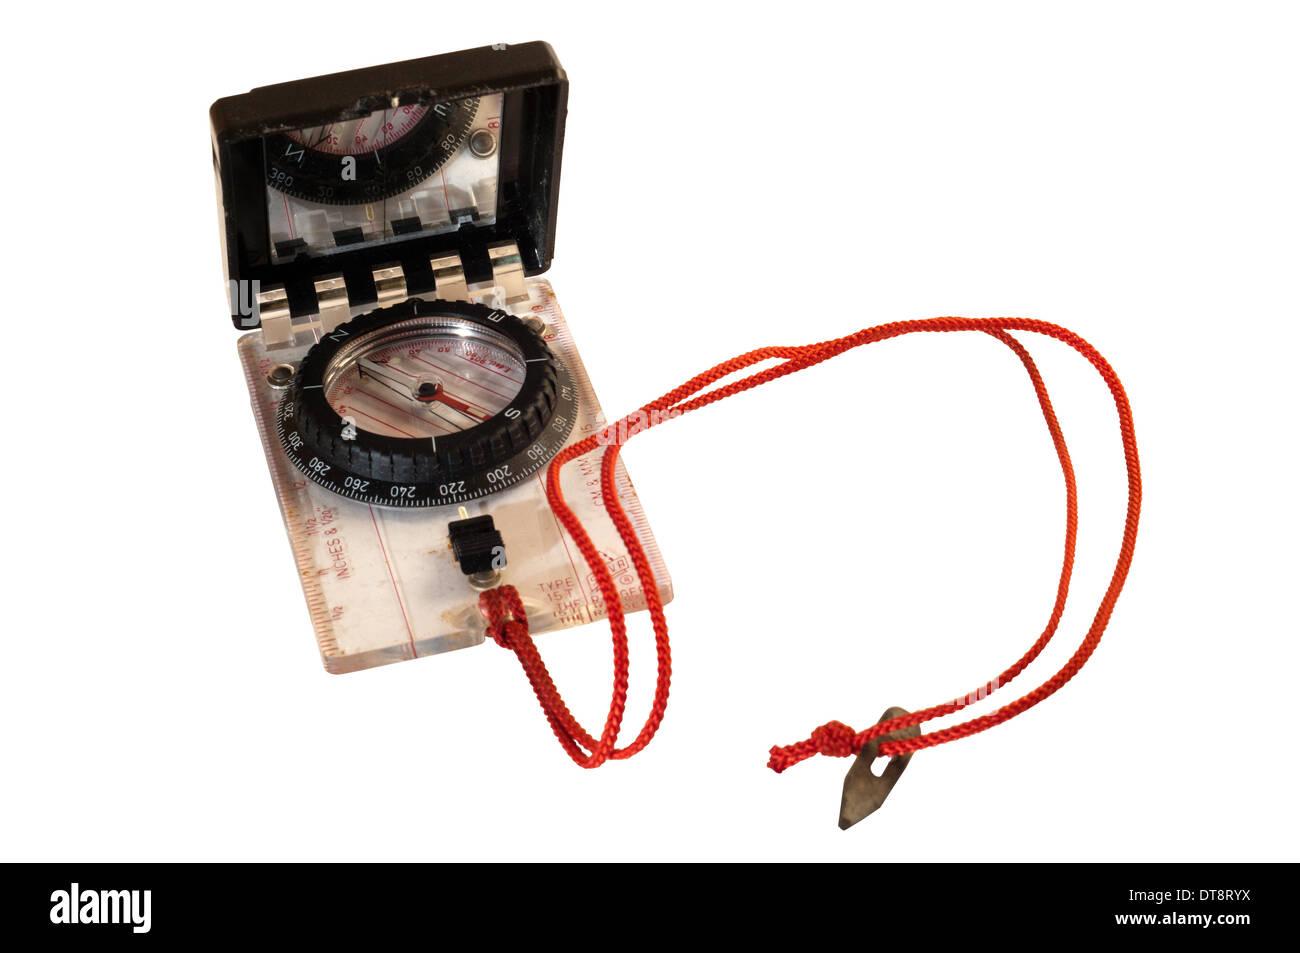 A Silva sighting compass and lanyard. - Stock Image